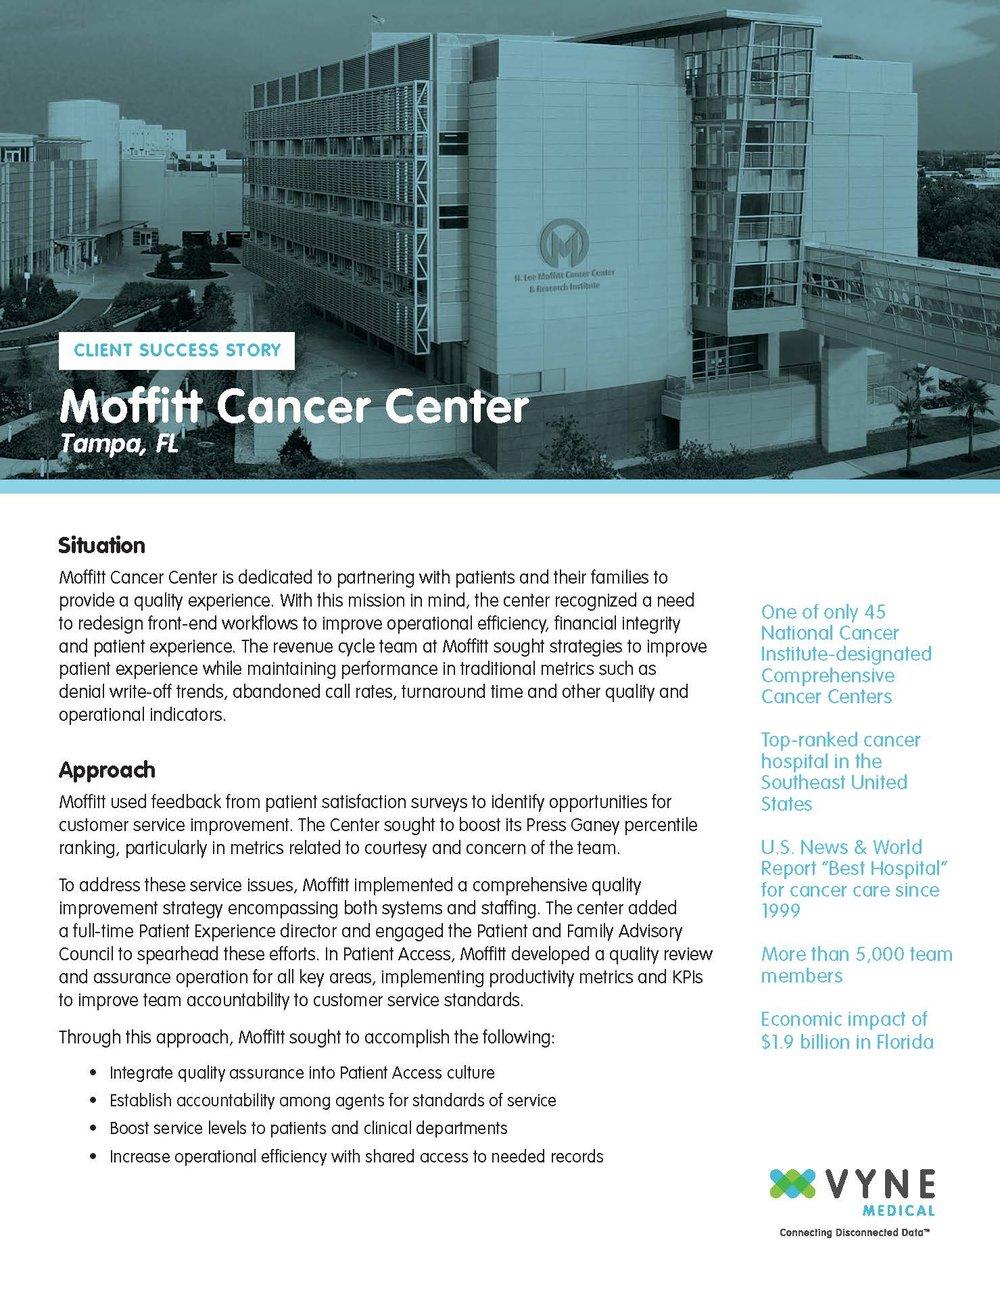 case-study-Moffitt-Cancer-Center_Page_1.jpg